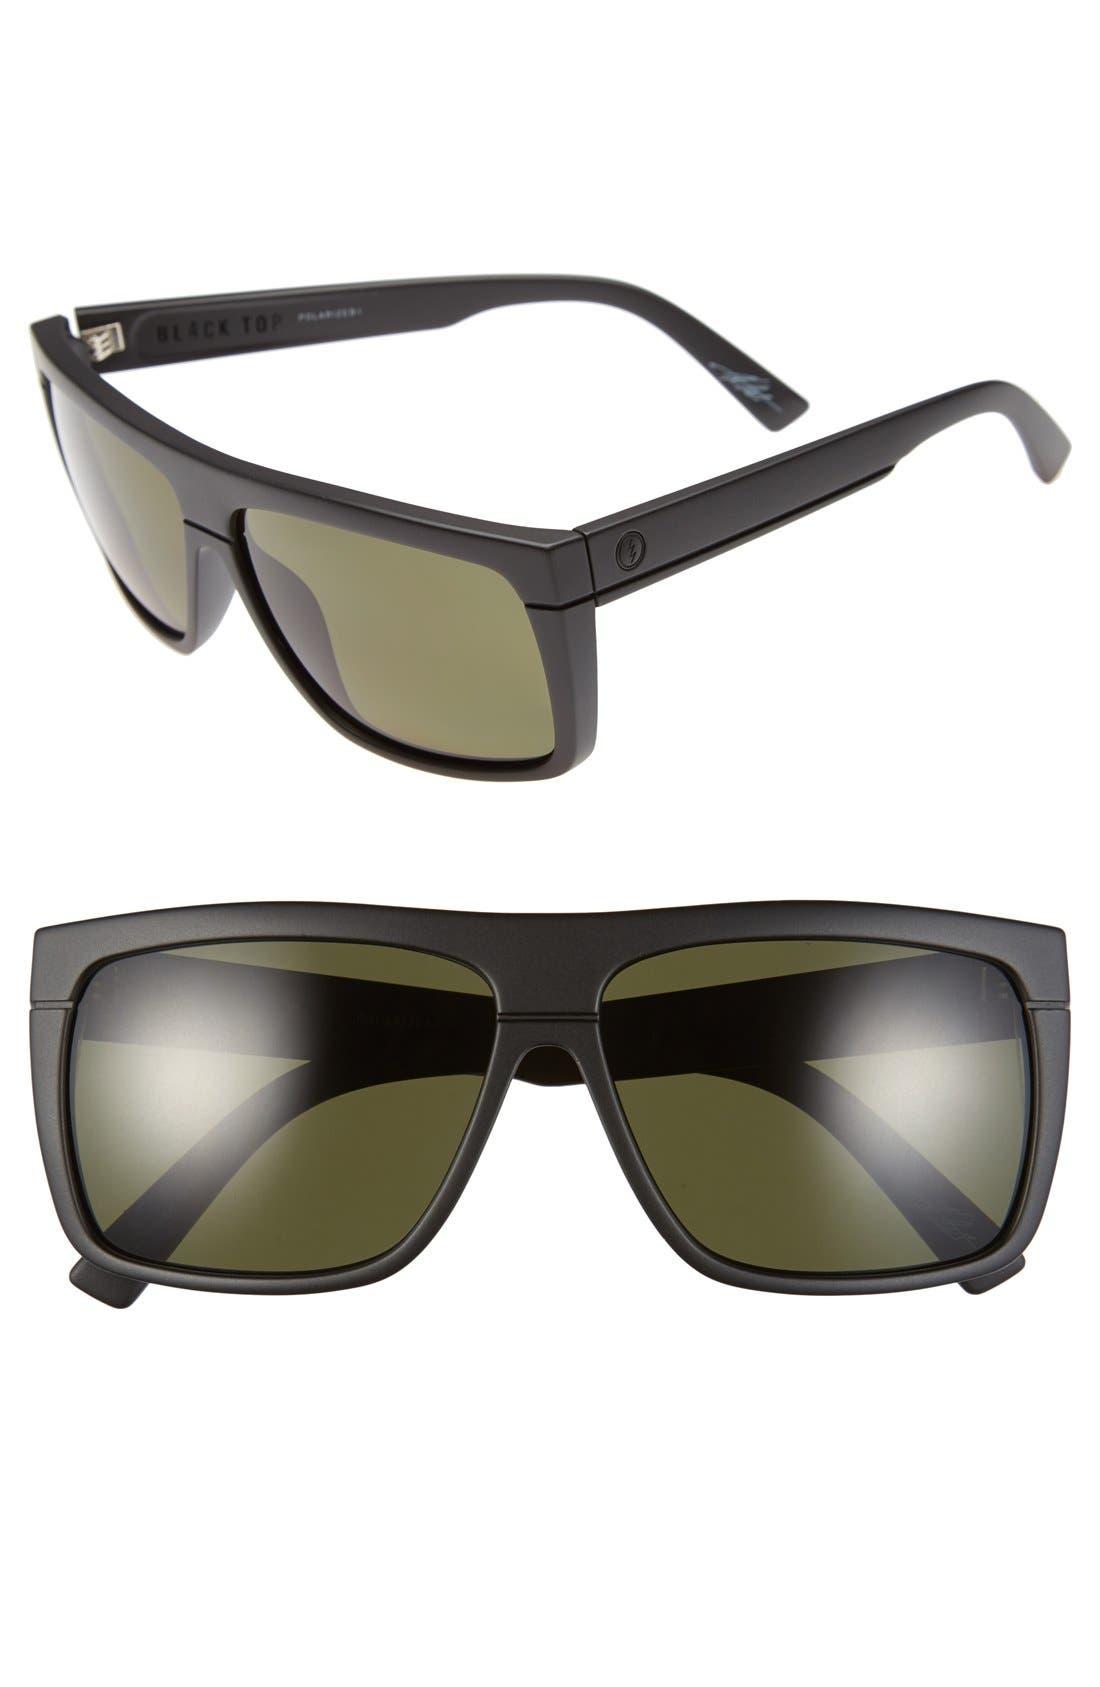 ELECTRIC 'Black Top' 60mm Polarized Flat Top Sunglasses